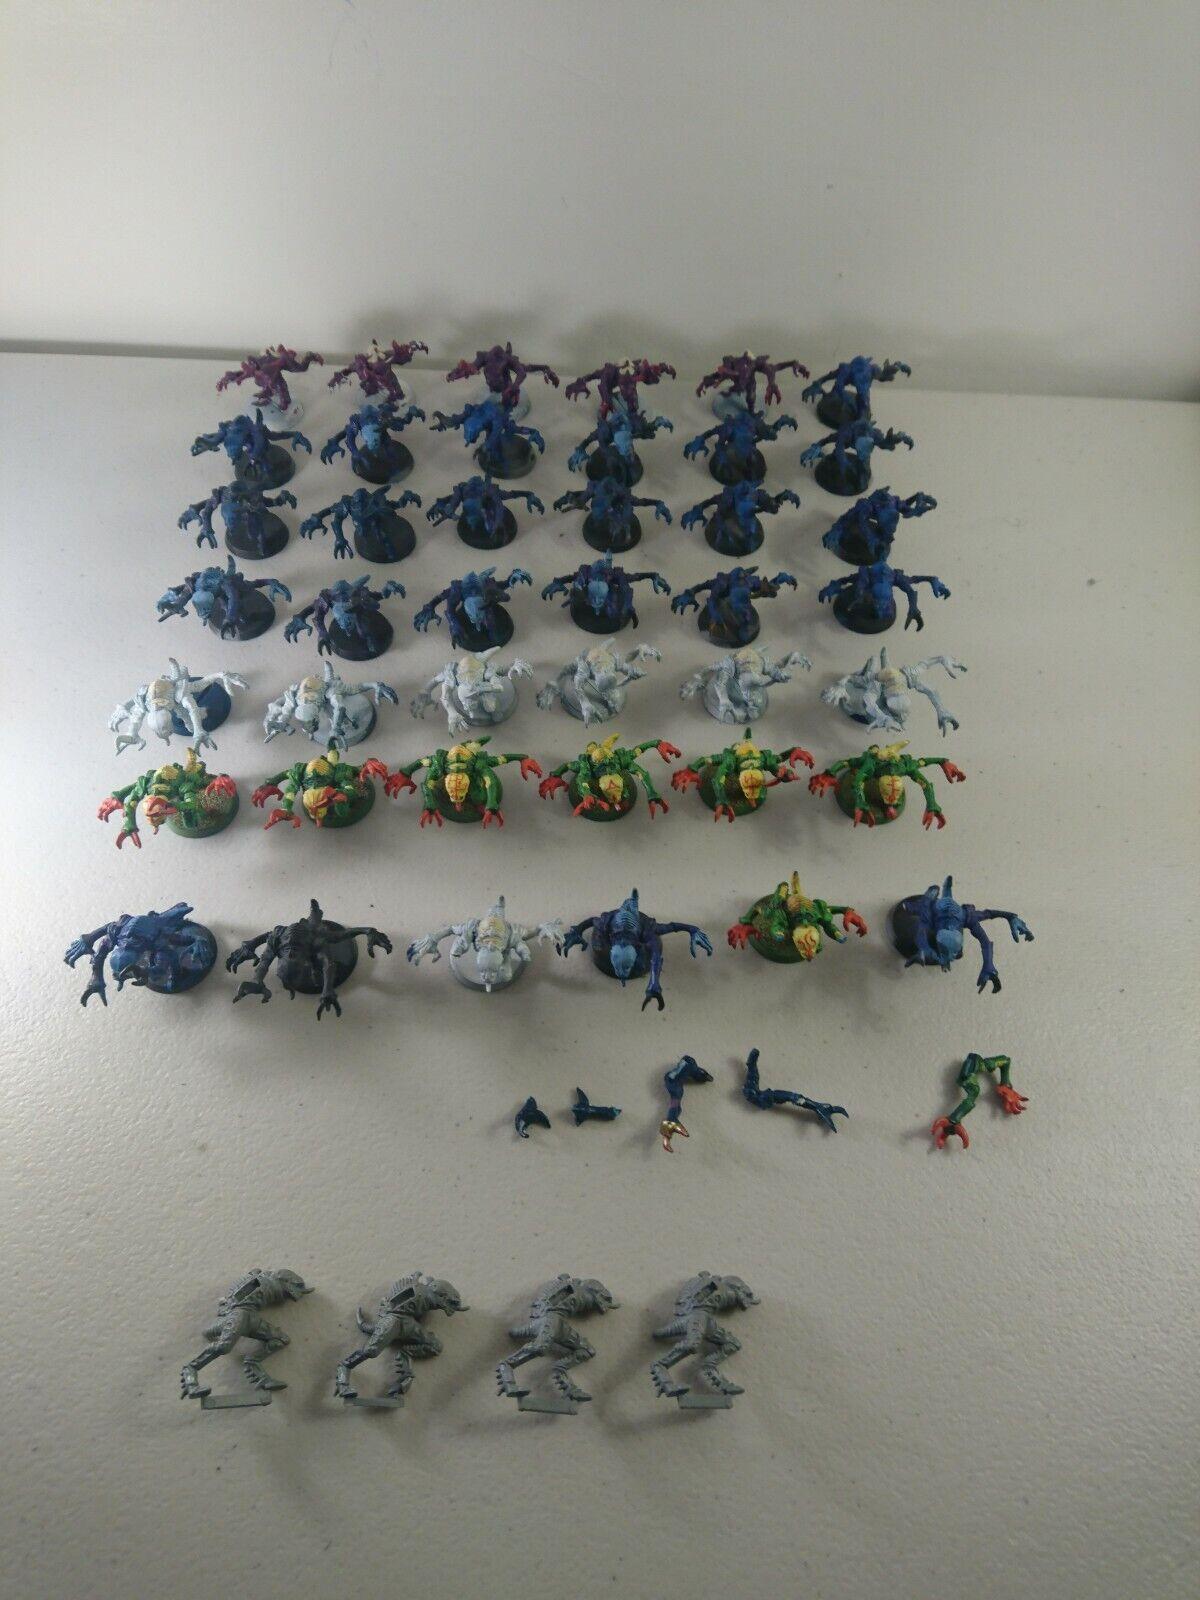 GW  Warhammer 40k 40,000 Tyranid Esercito SQUADRA spazio HULK genestealers x 38 (+8)  negozio d'offerta